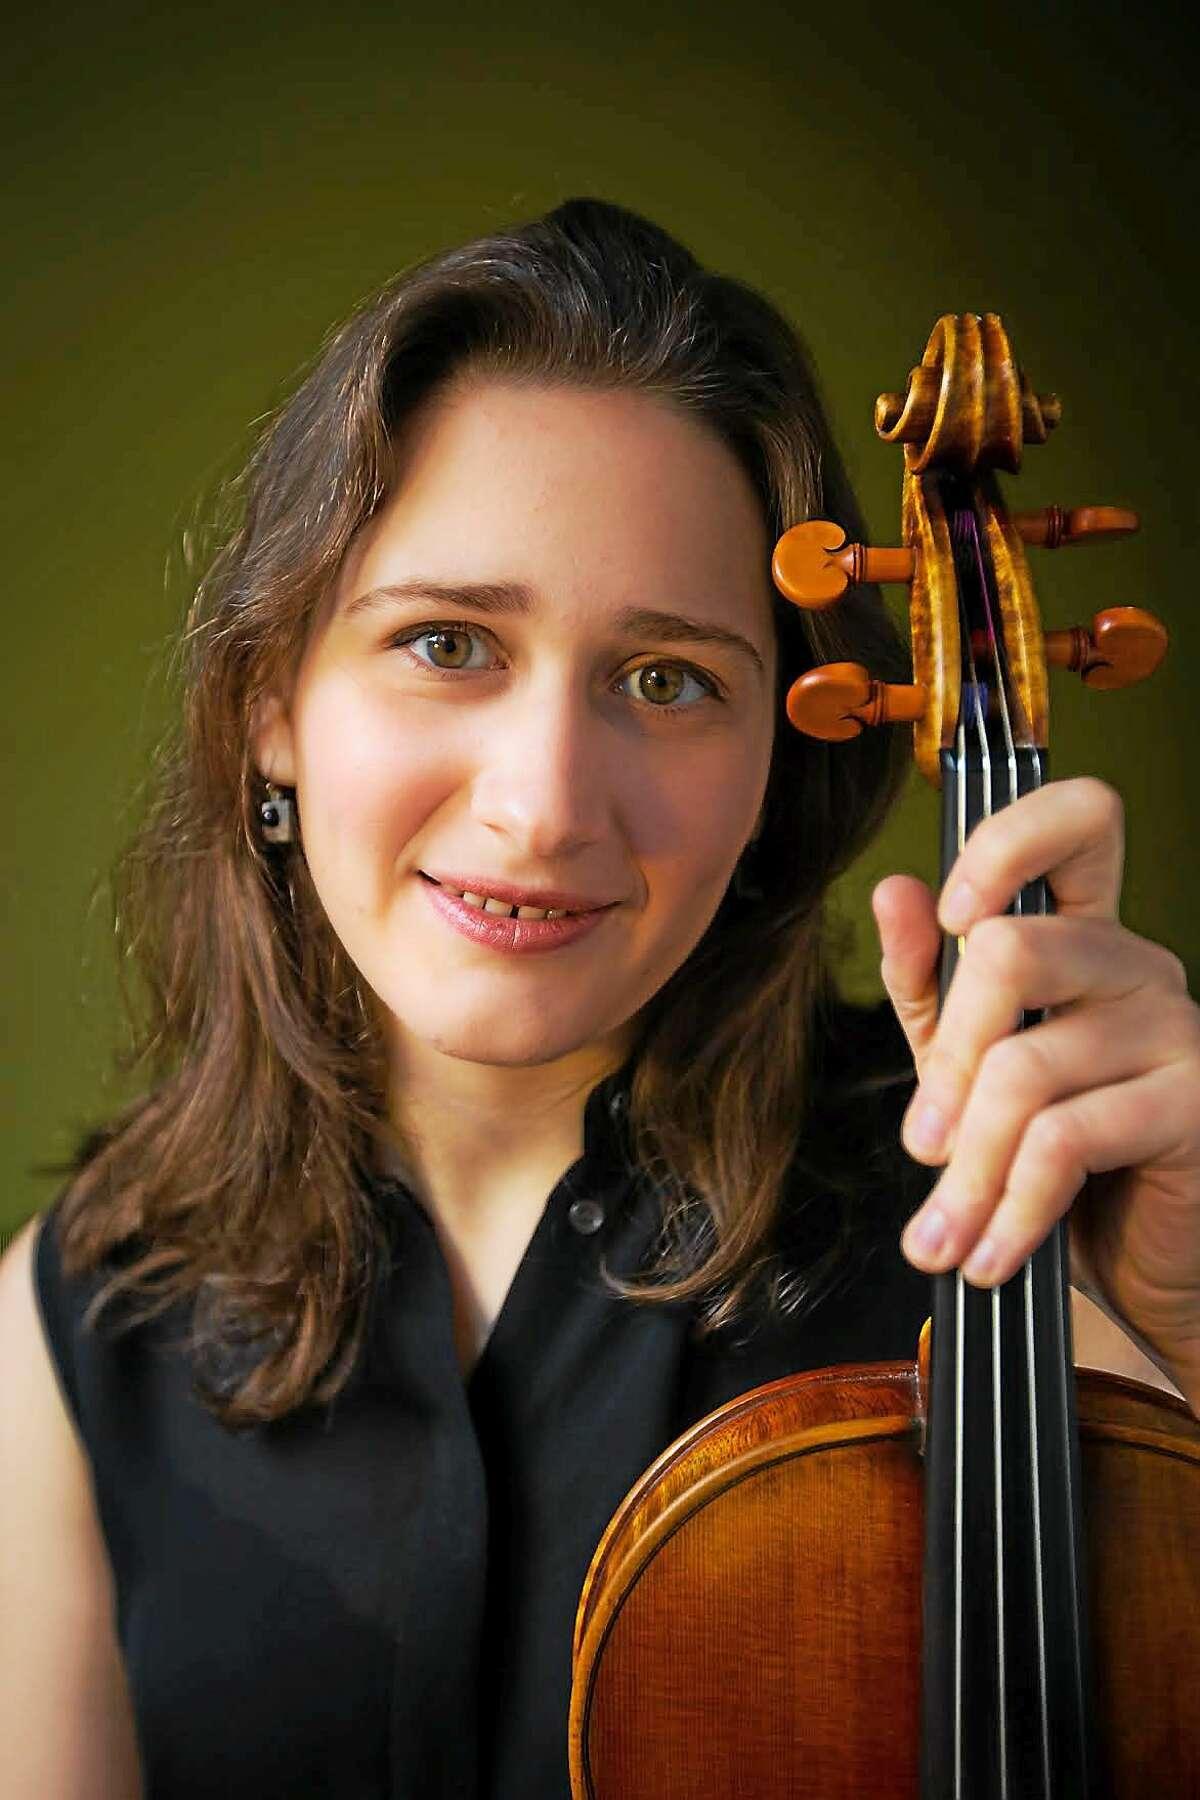 Violist Isabella Mensz, who will play the Osvaldo Golijov program this weekend.